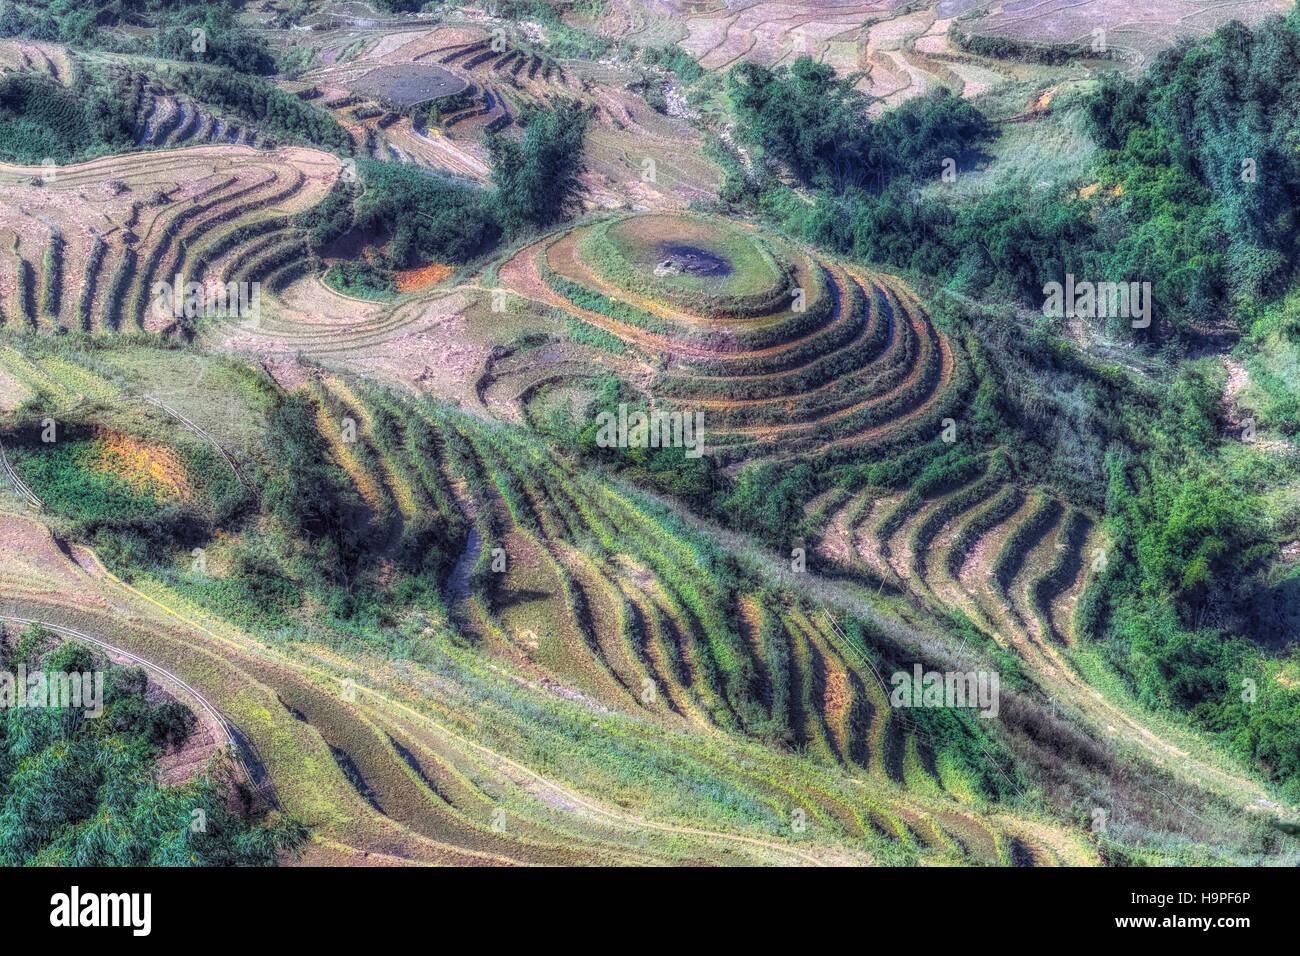 Rice terraces, Lao Cai, Sapa, Vietnam, Asia - Stock Image